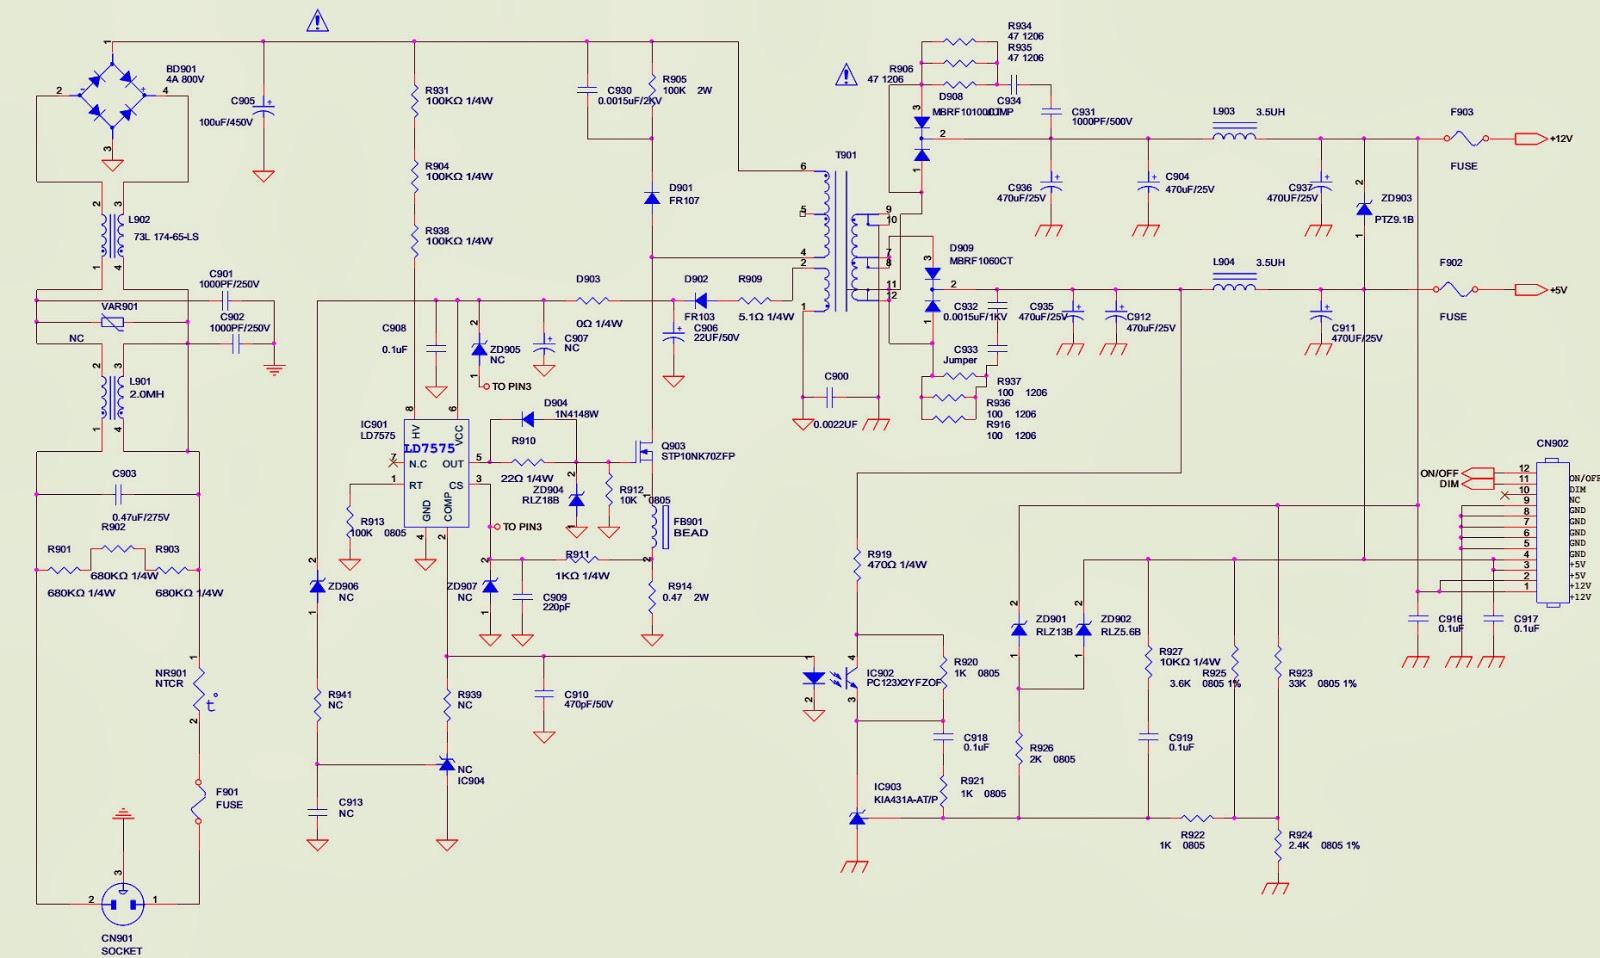 HCL HCM9LWAT11  19 INCH LCD MONITOR – POWER SUPPLY